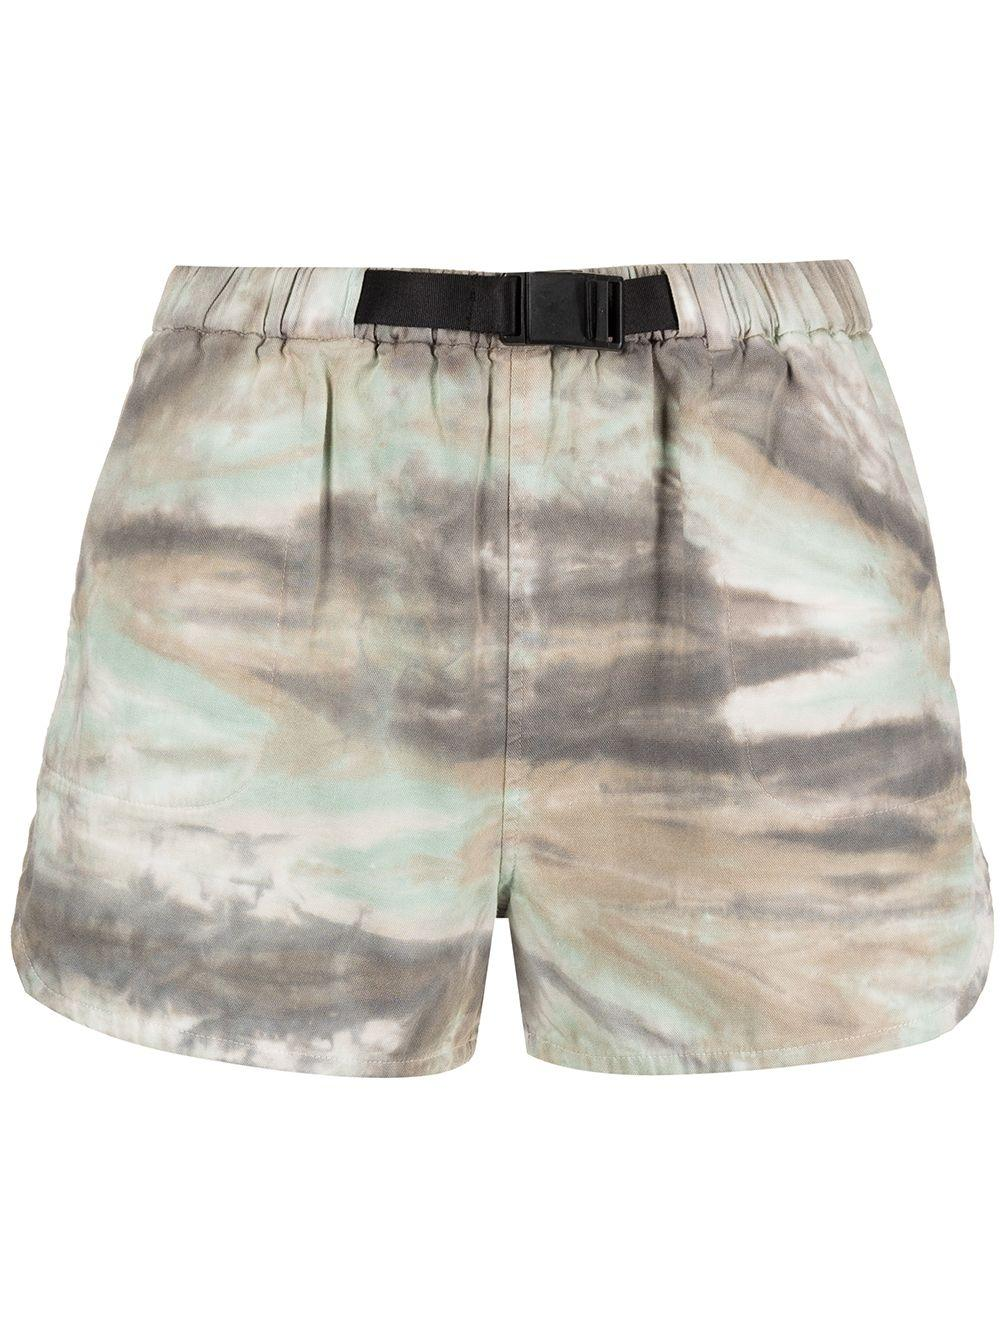 Summit Camo Shorts